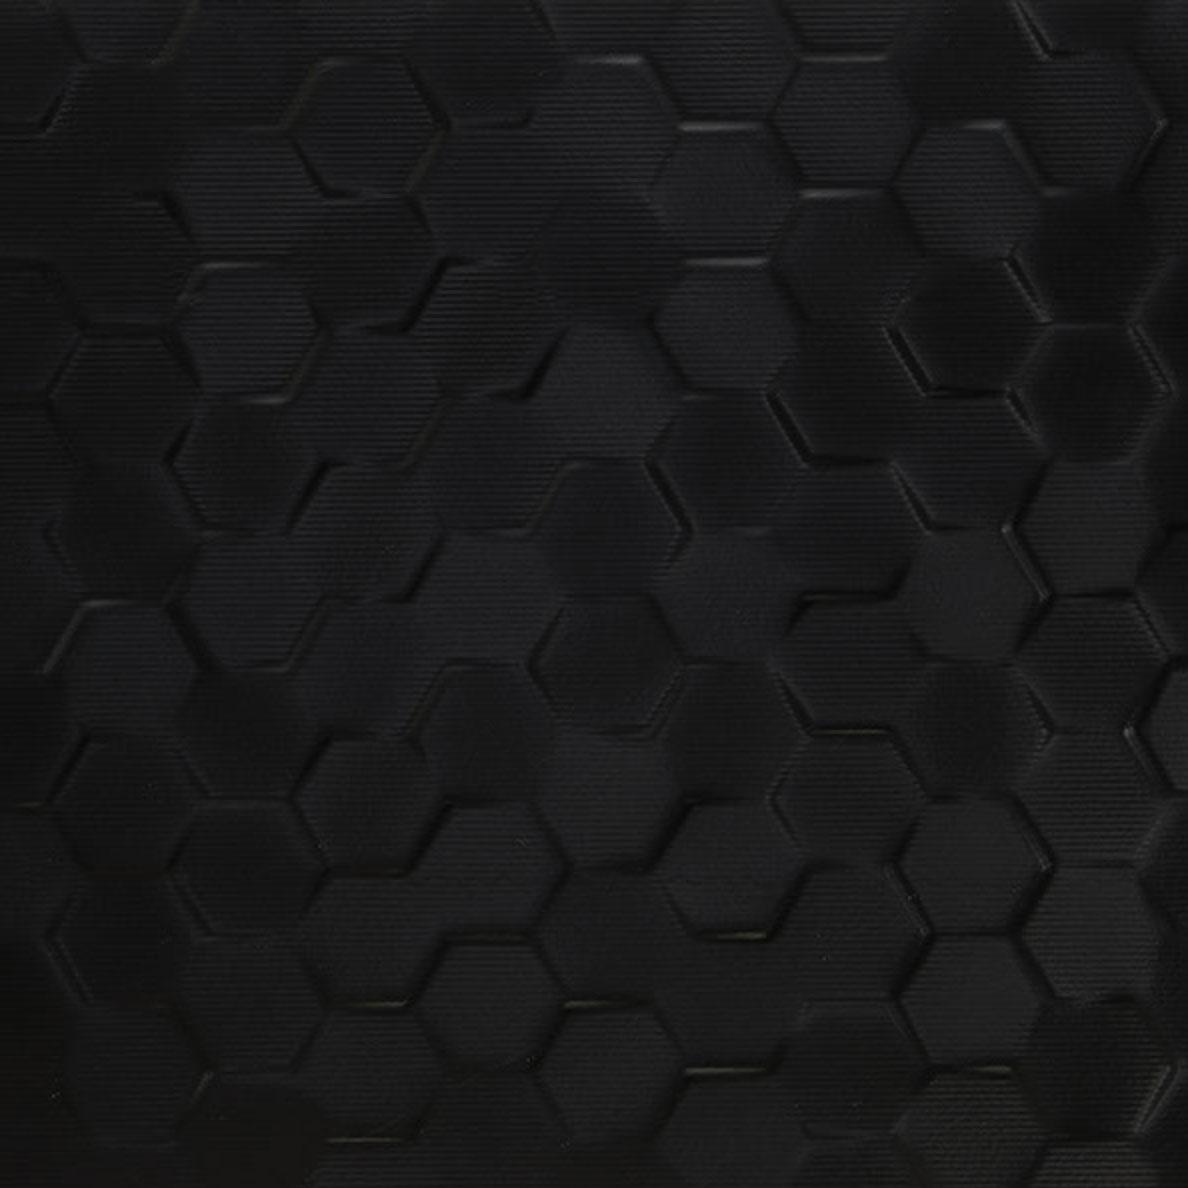 Multitude Domino Black Hexagon